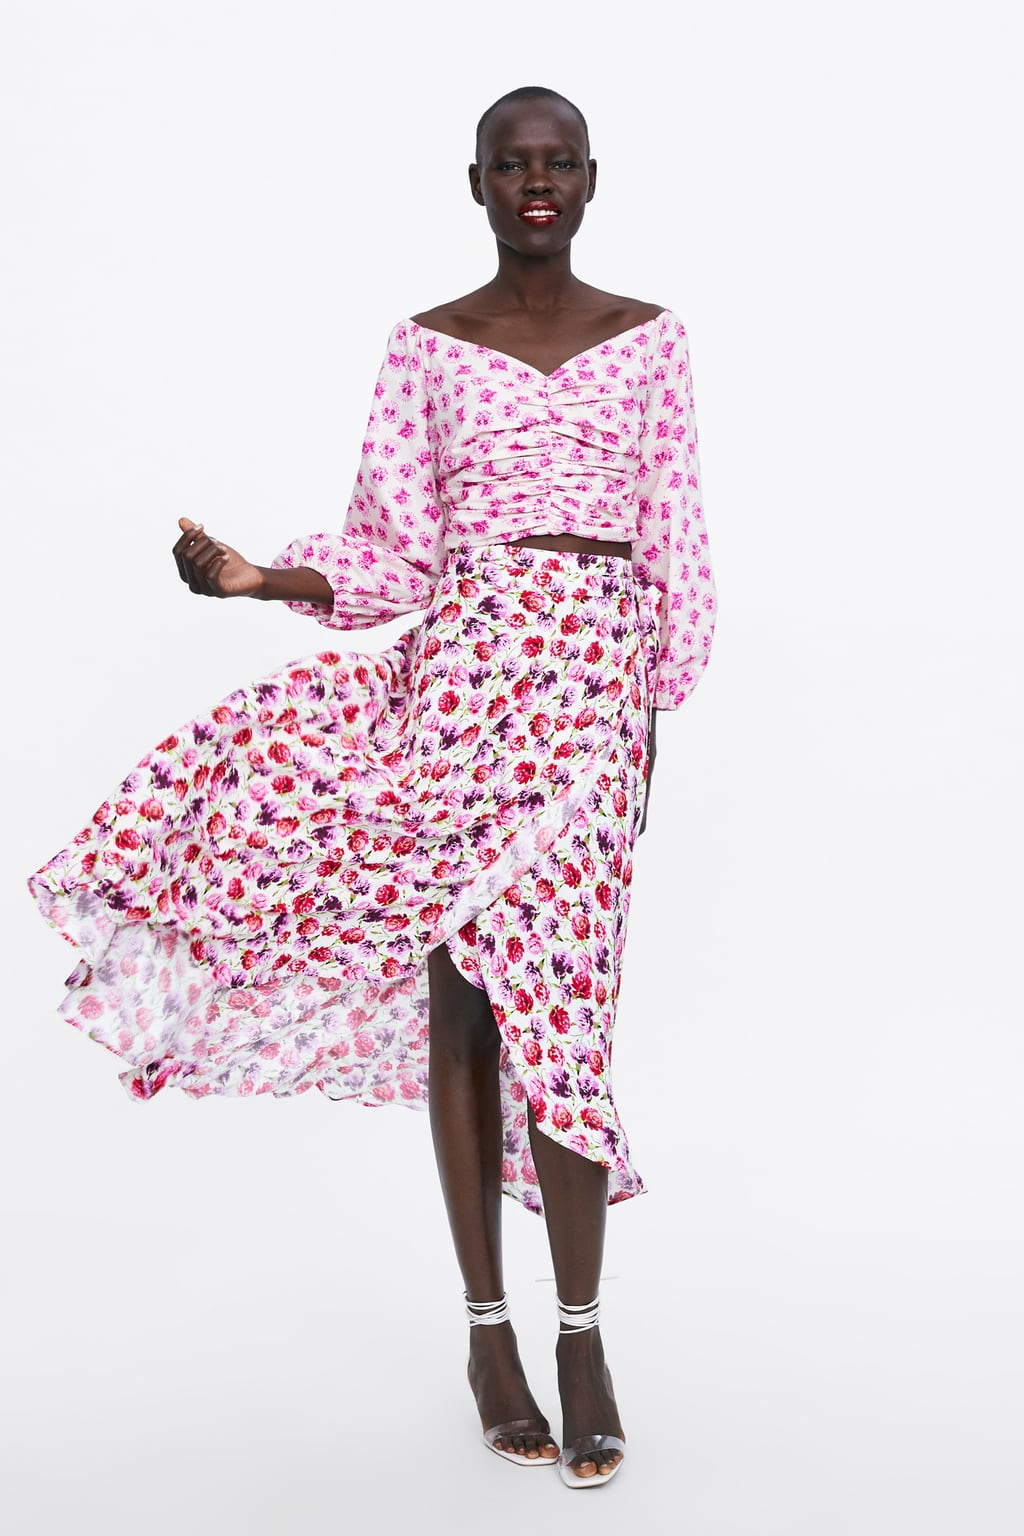 Wrap Skirts: 5 ανάλαφρα καλοκαιρινά κομμάτια και πώς να τα φορέσεις